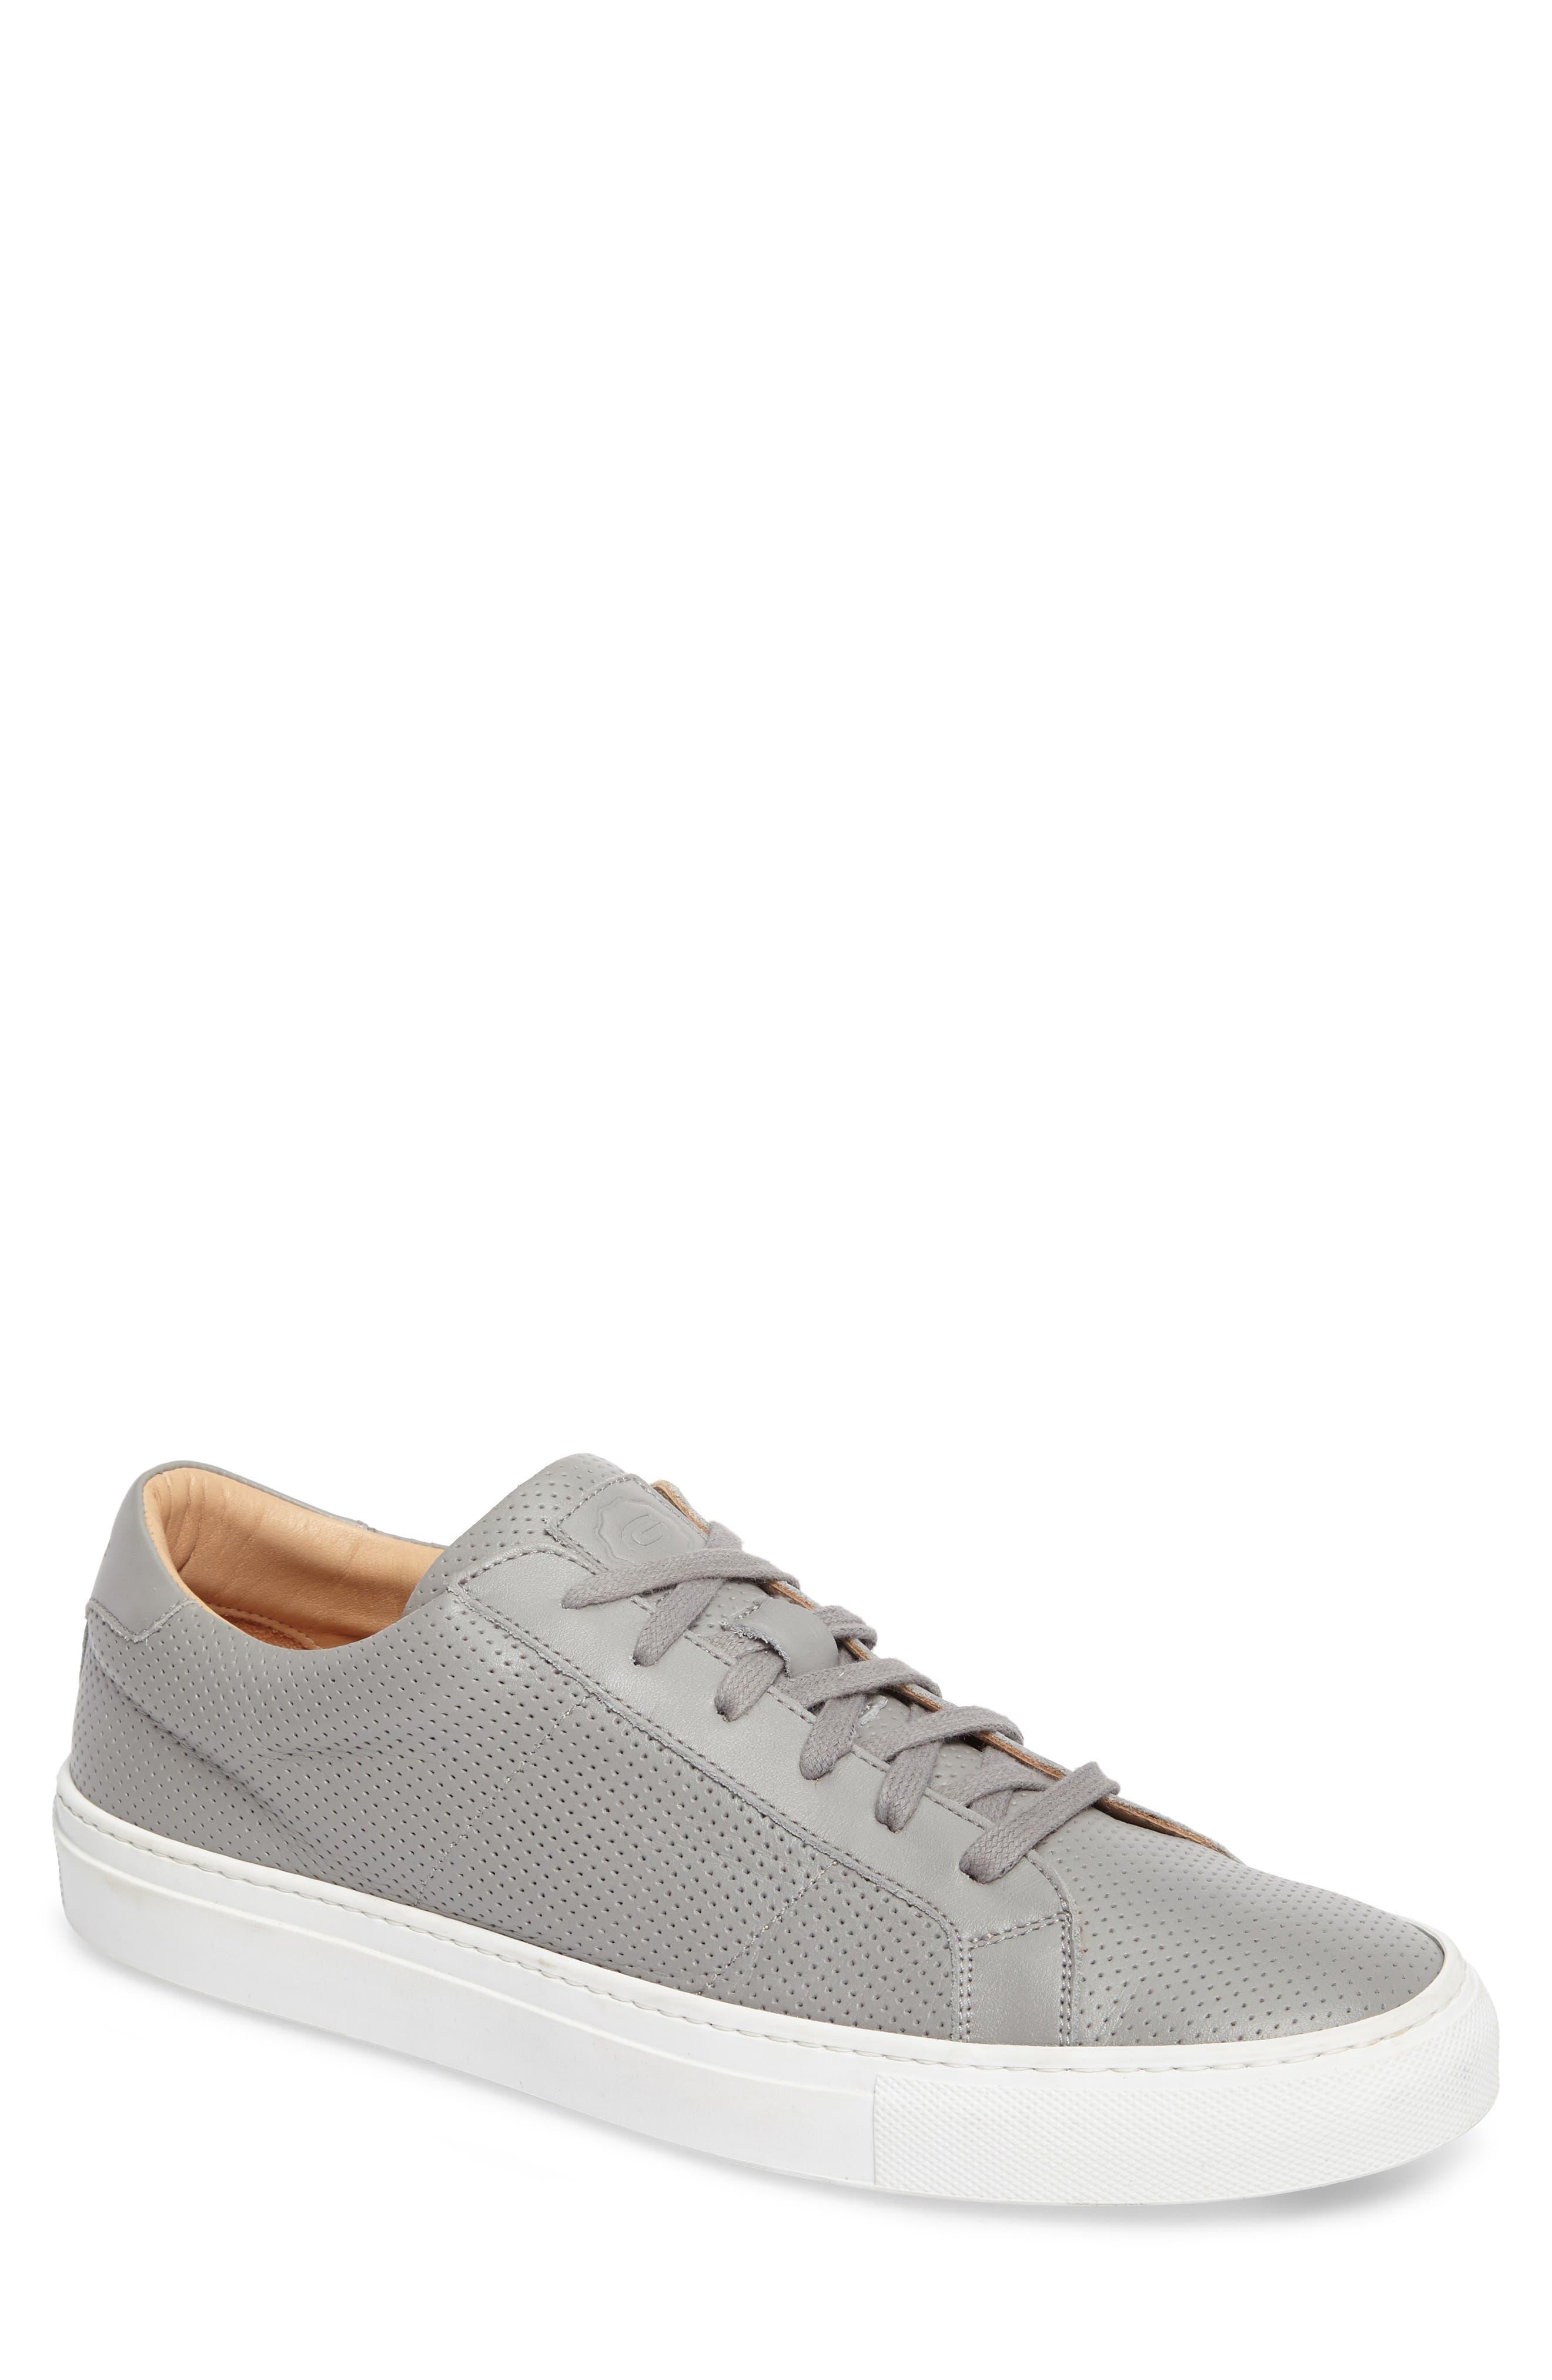 Greats Royale Perforated Low Top Sneaker (Men)